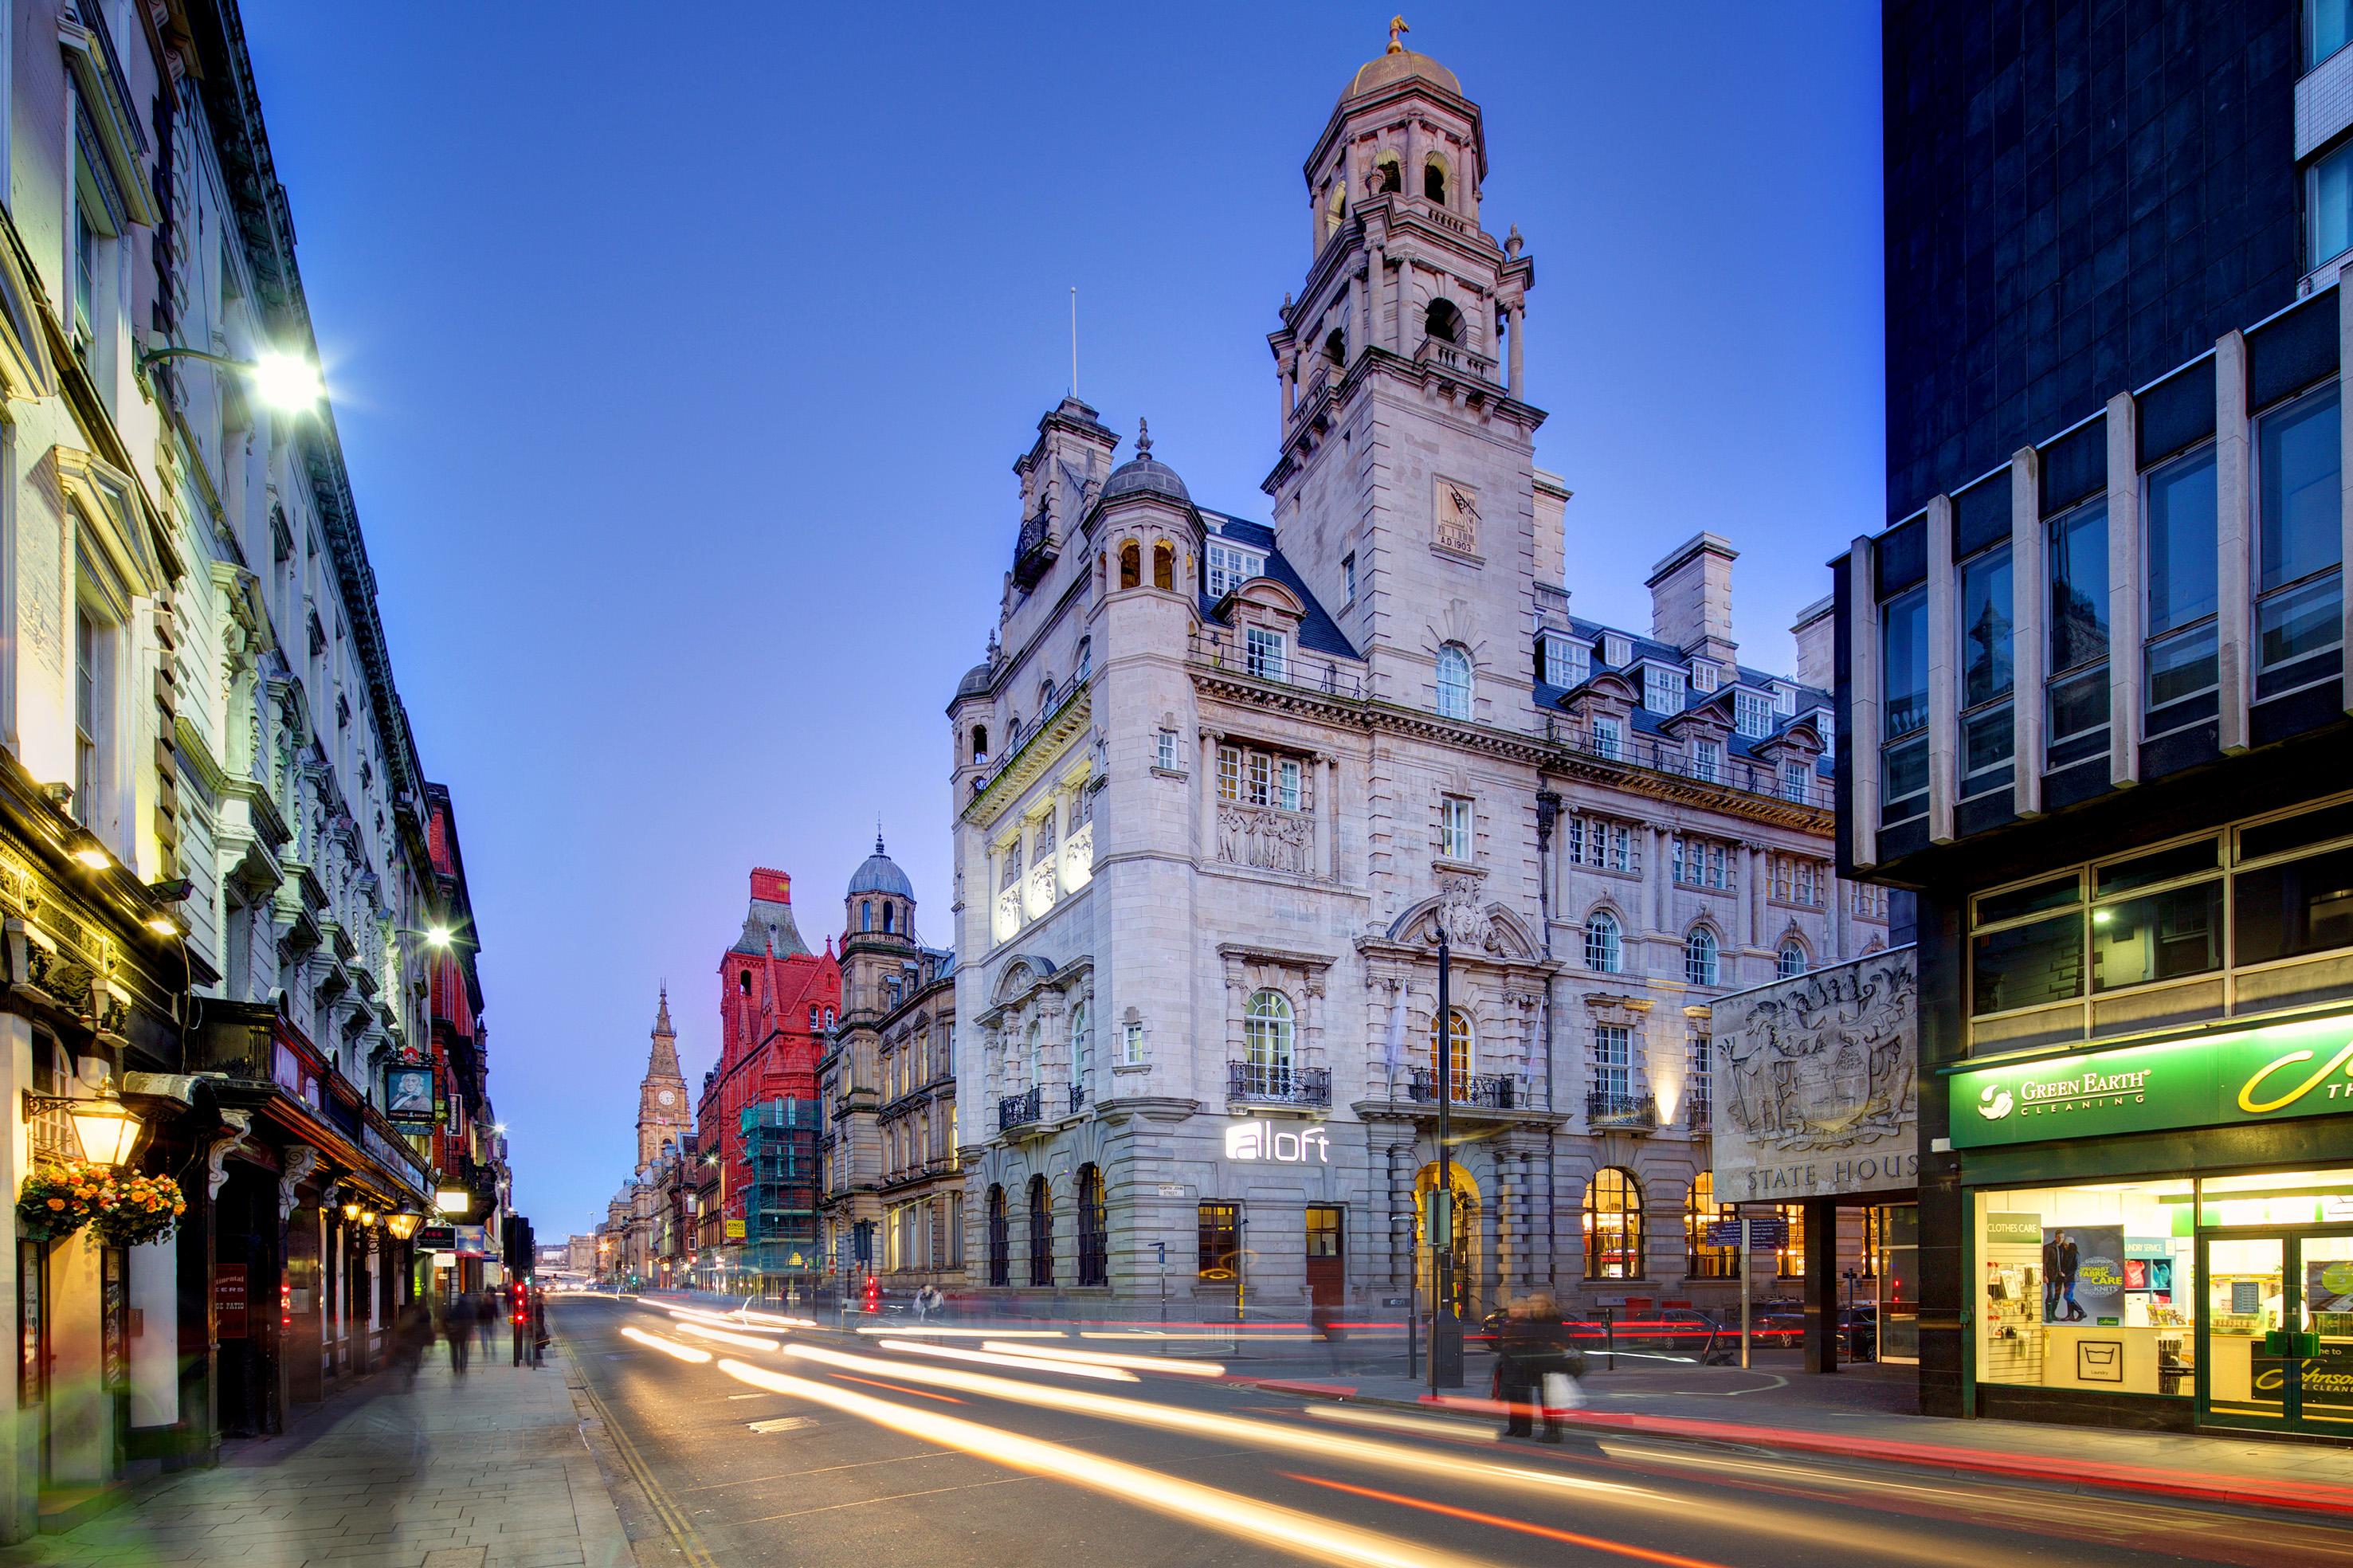 Aloft_Hotel_Liverpool_9305